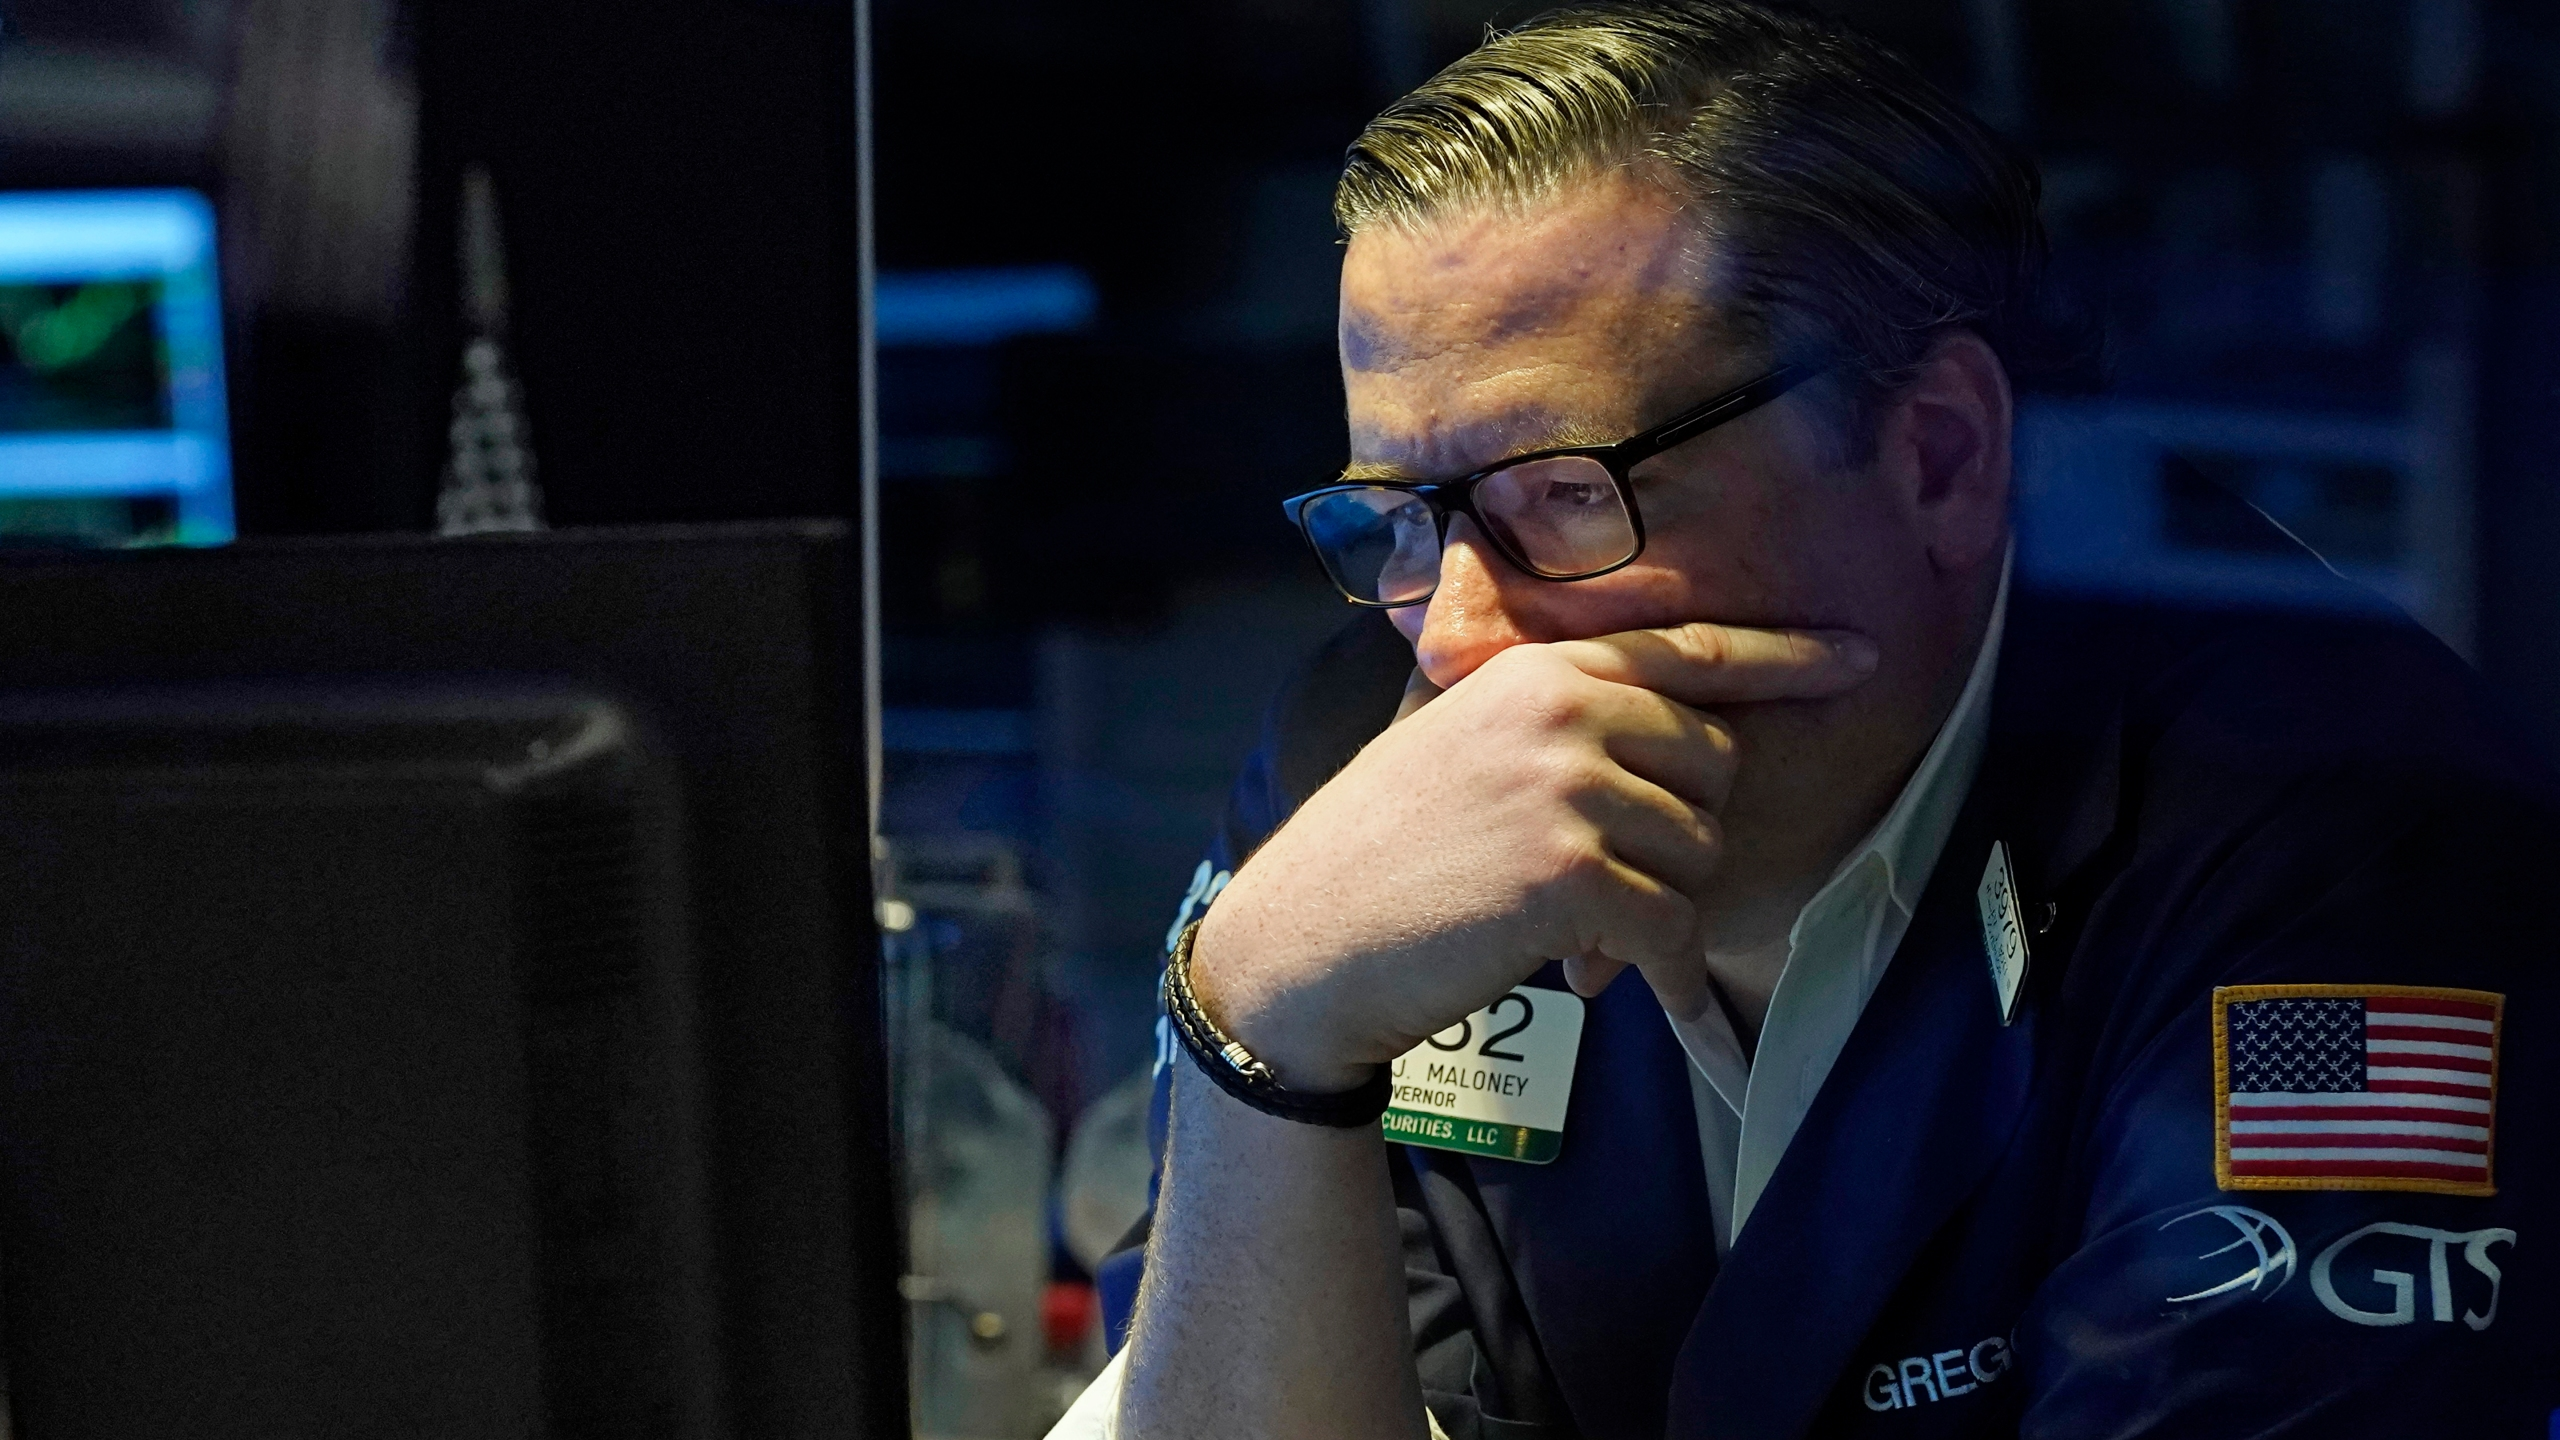 Investors dump stocks, buy bonds as COVID fears flare again